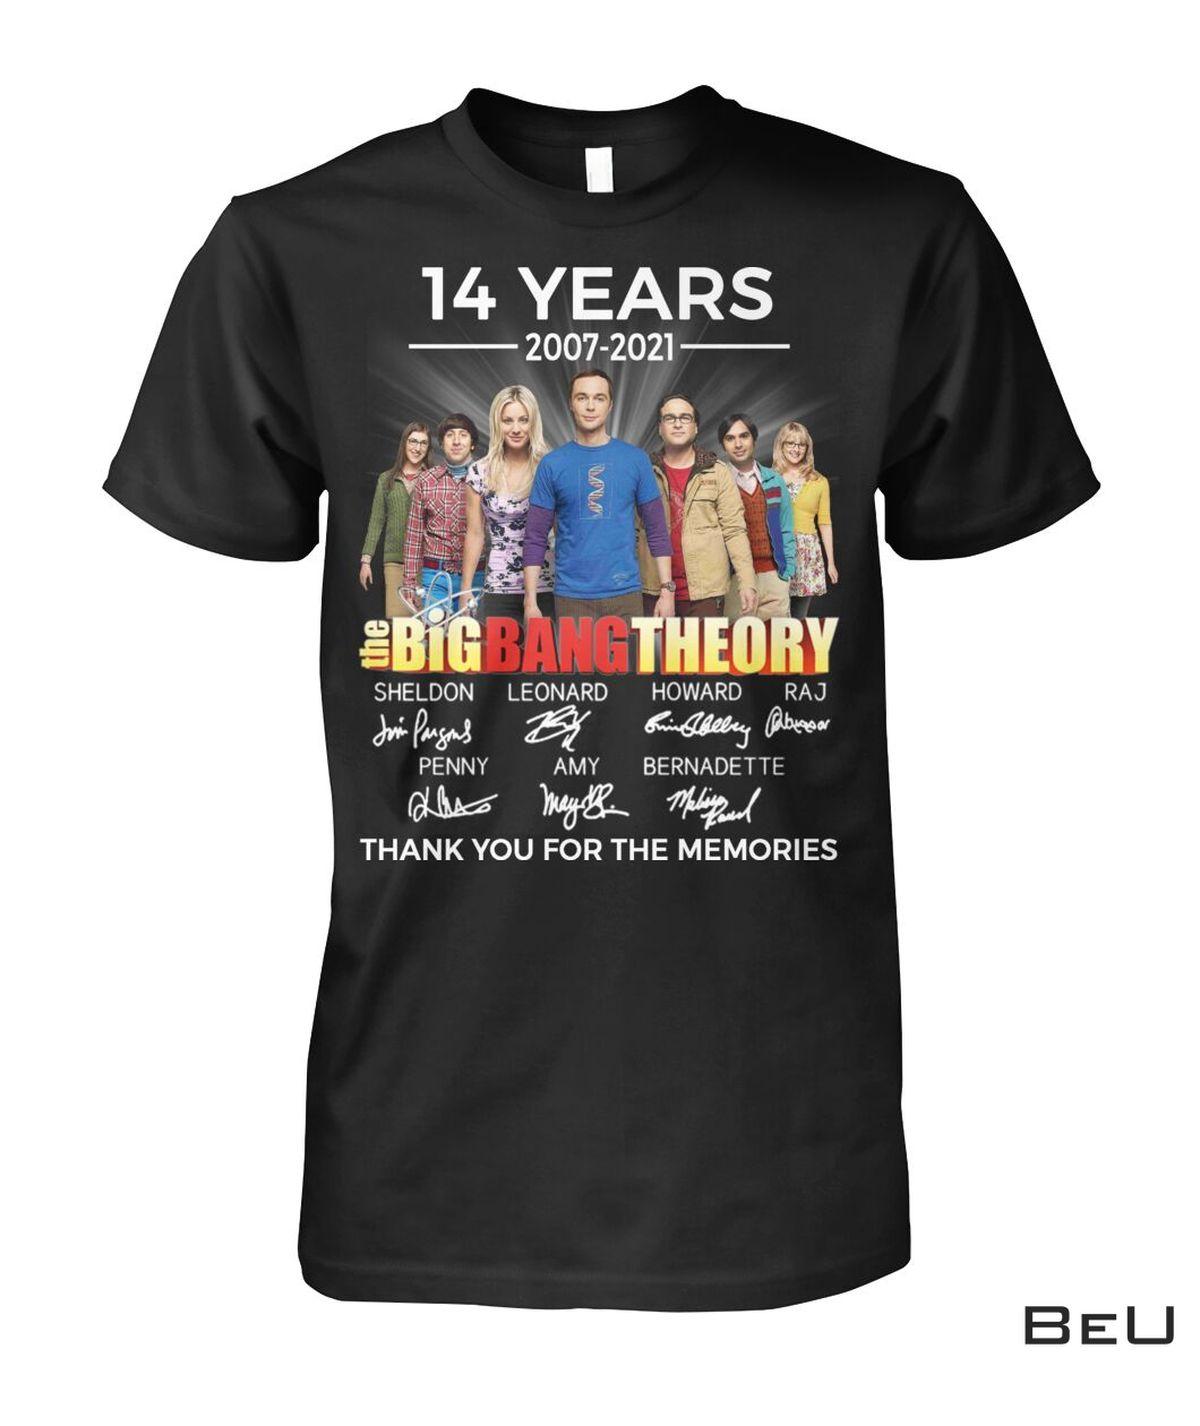 Top Rated The Big Bang Theory 14 Years 2007 2021 Shirt, hoodie, tank top